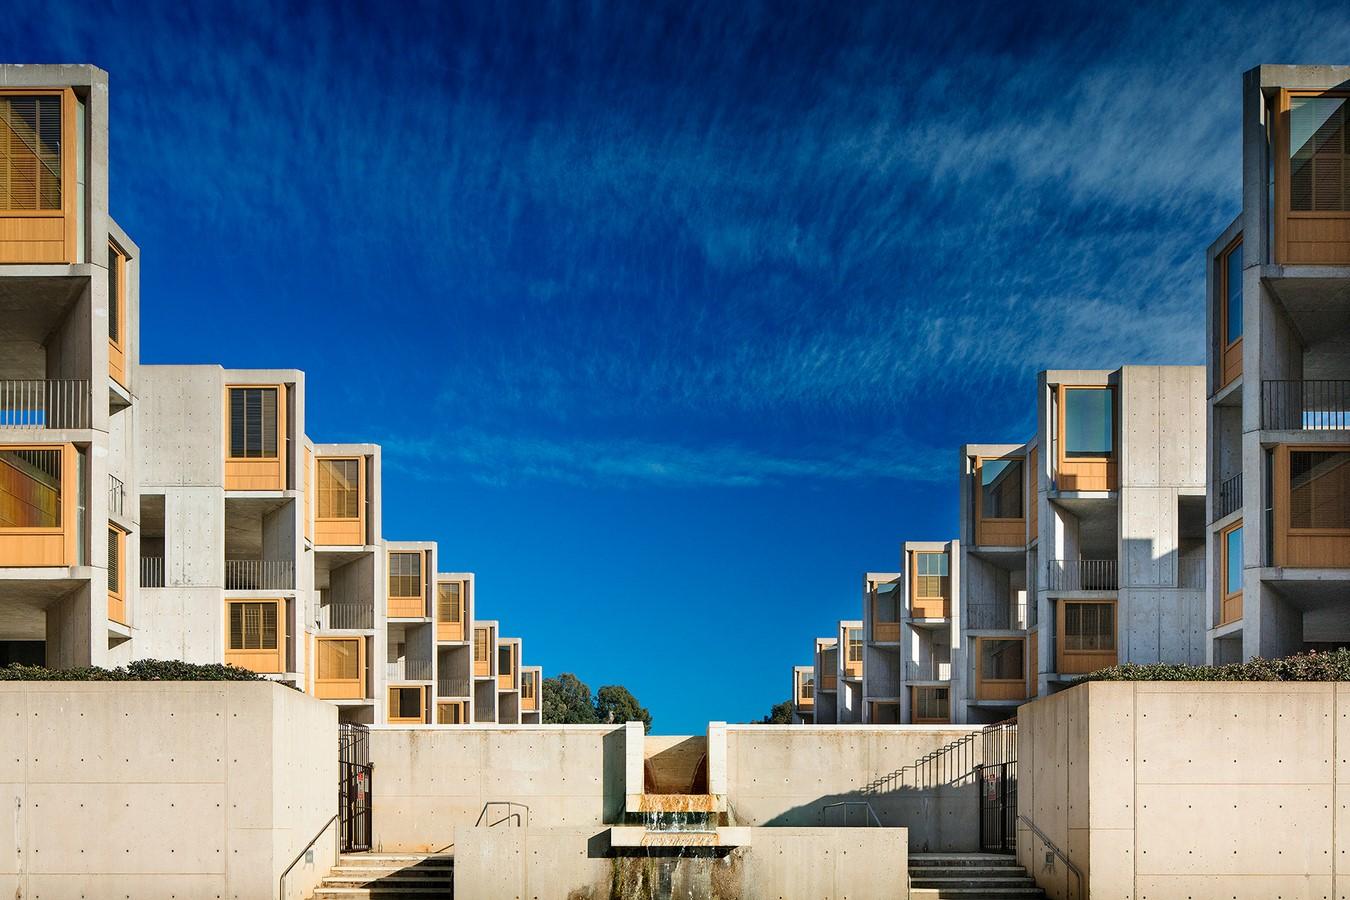 Salk Institute for Biological Sciences, San Diego, California, USA by Louis Kahn - Sheet4